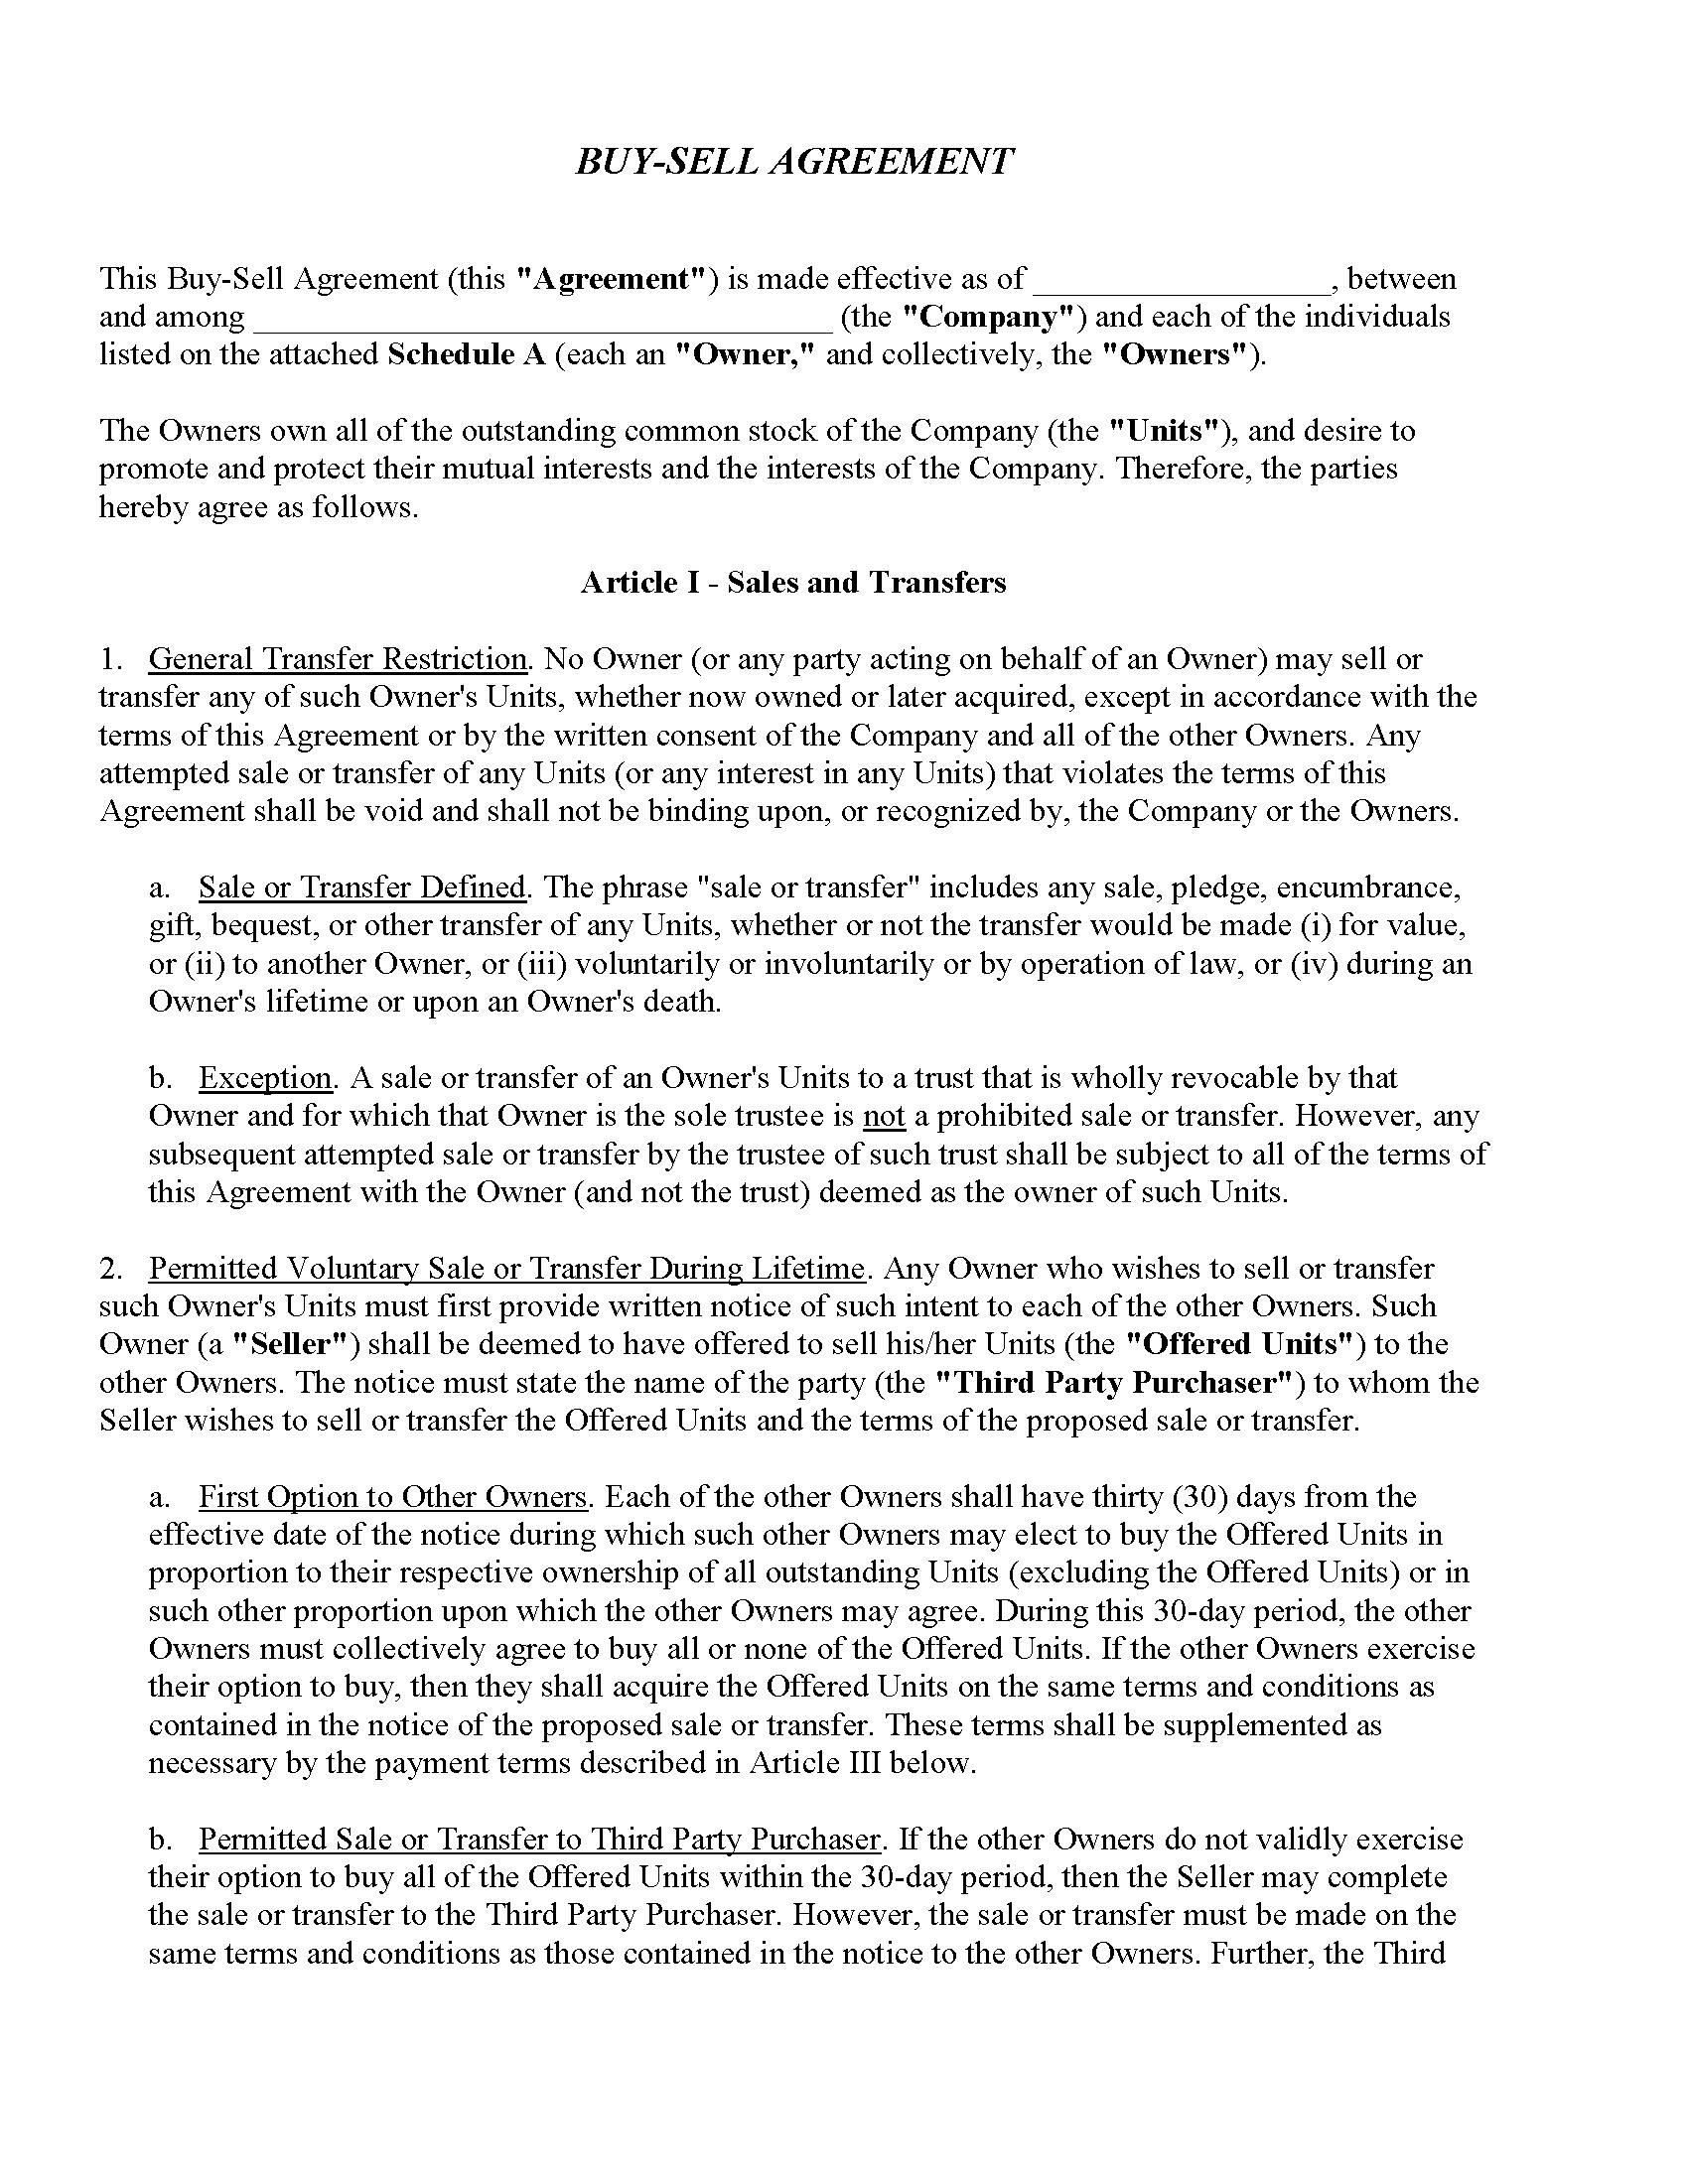 Washington DC Buy-Sell Agreement